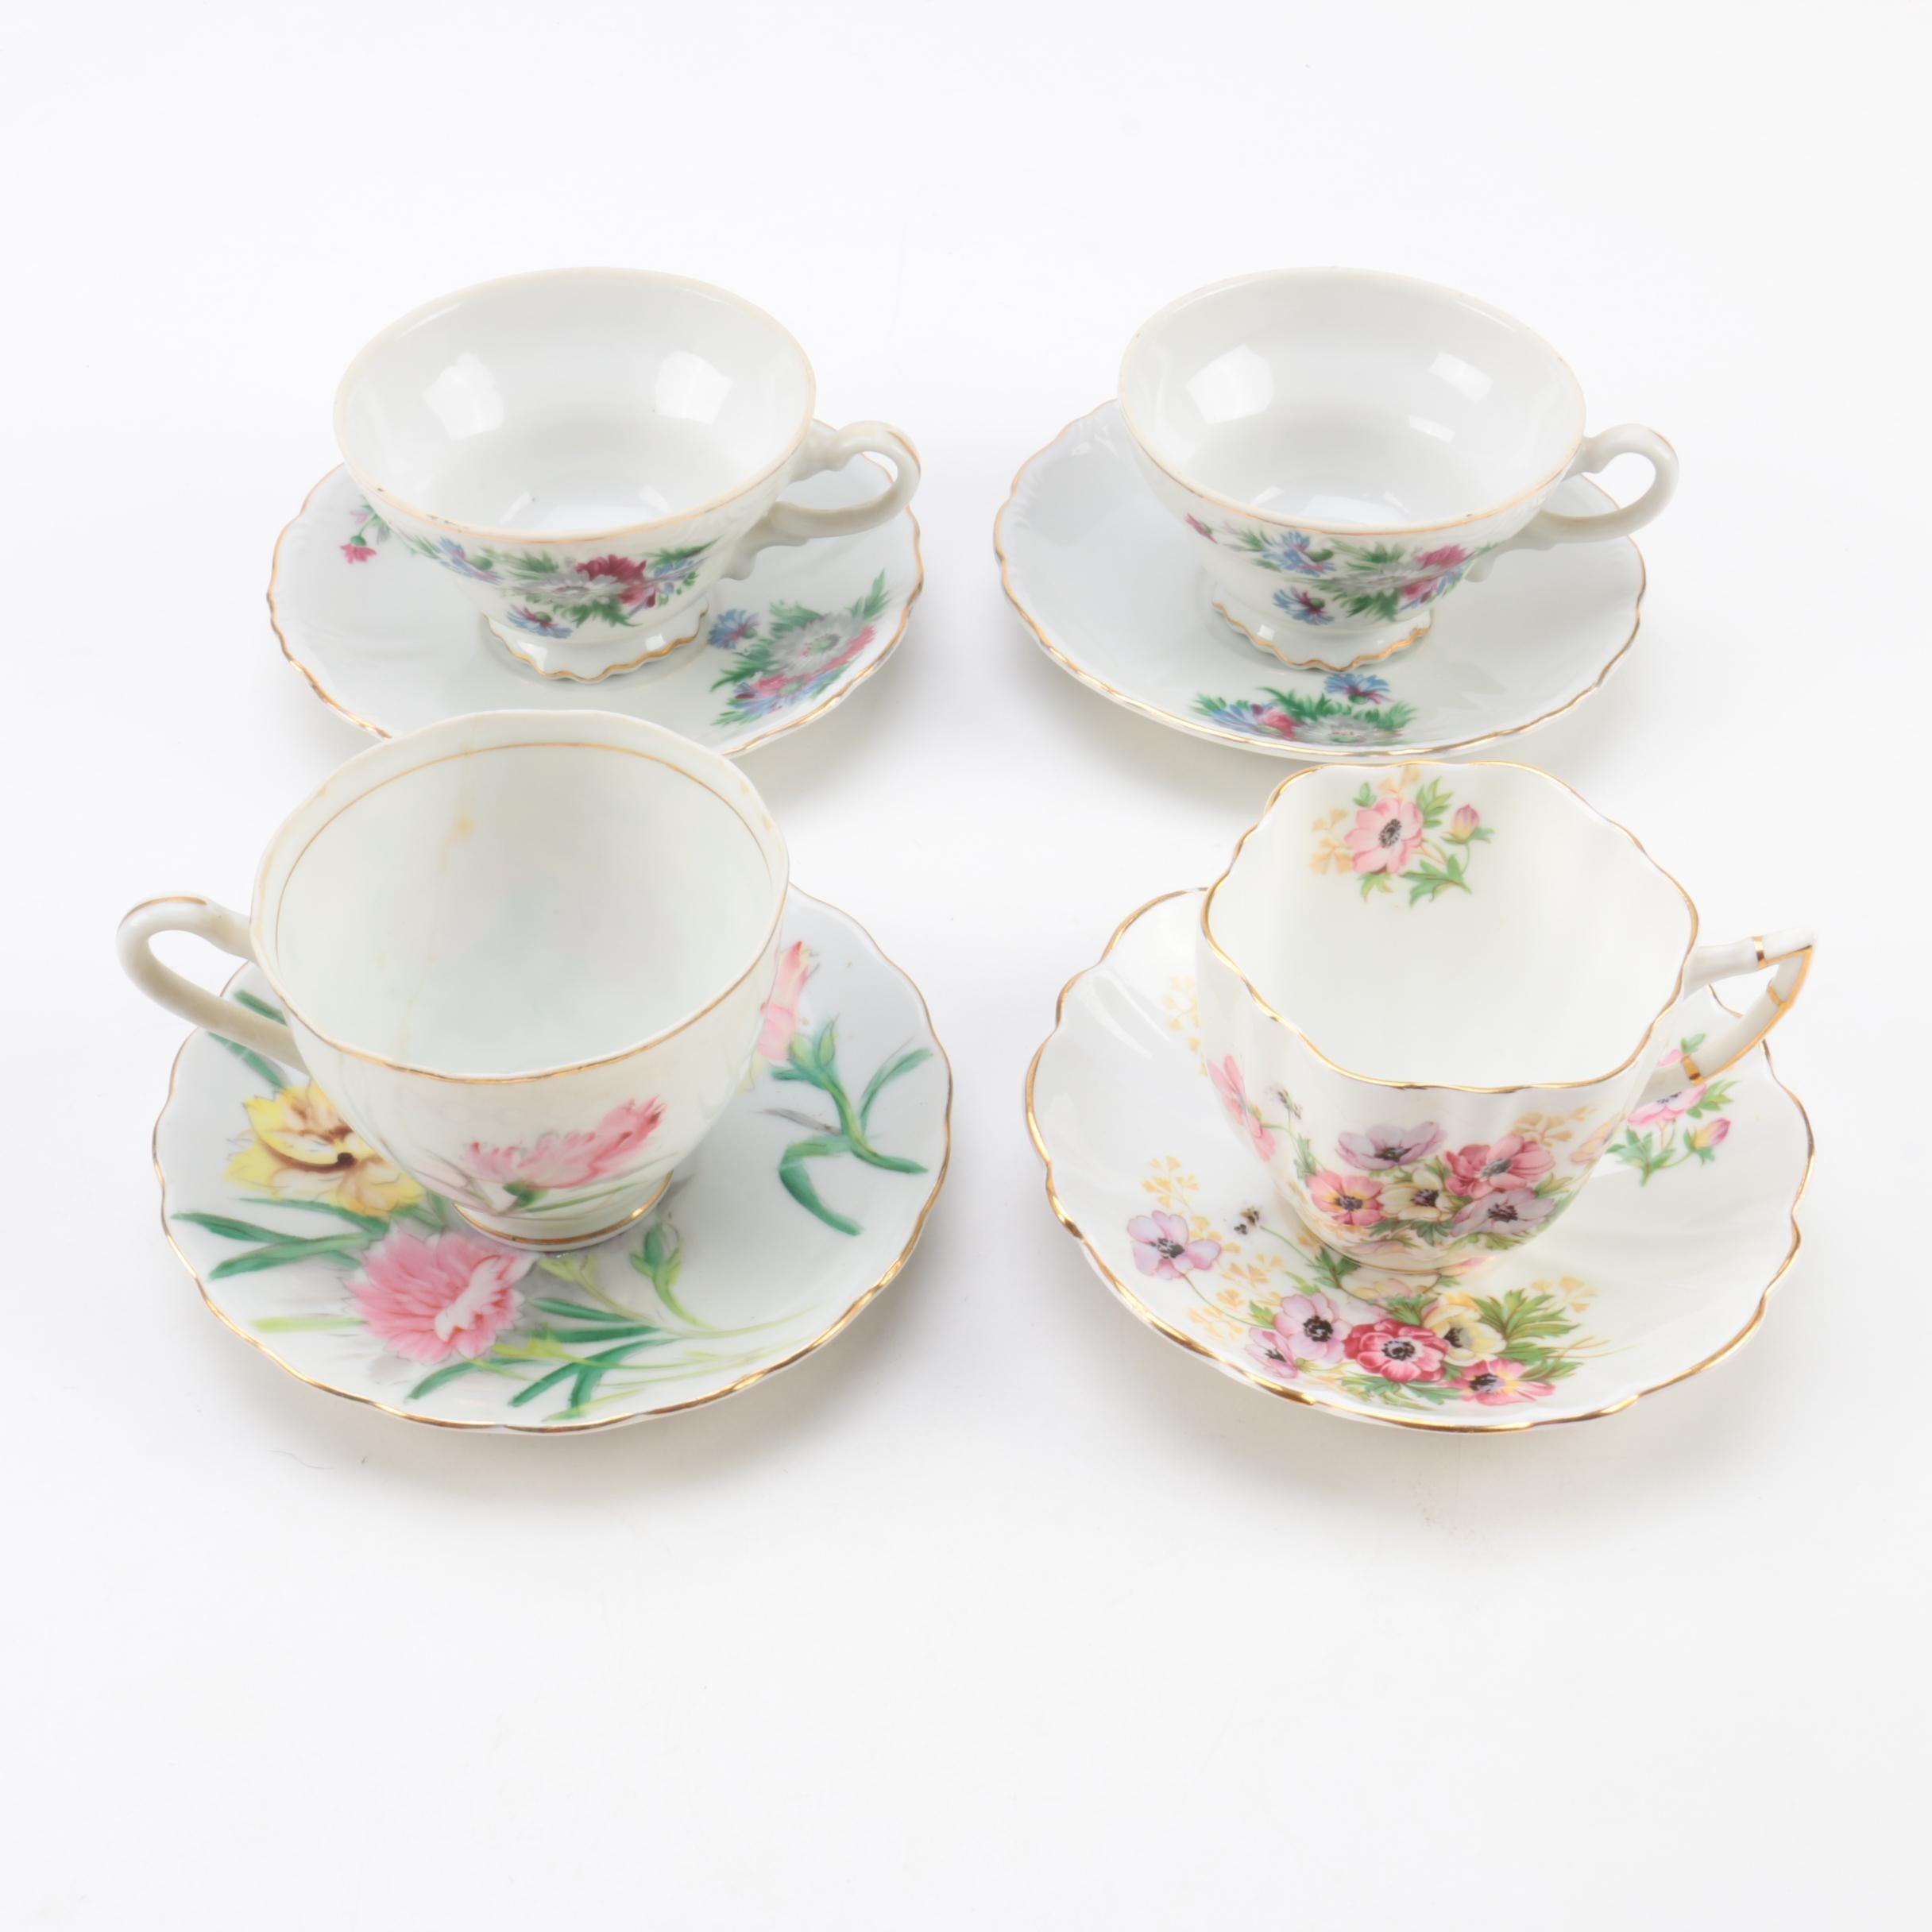 Vintage Teacups and Saucers Including Kasuga Ware